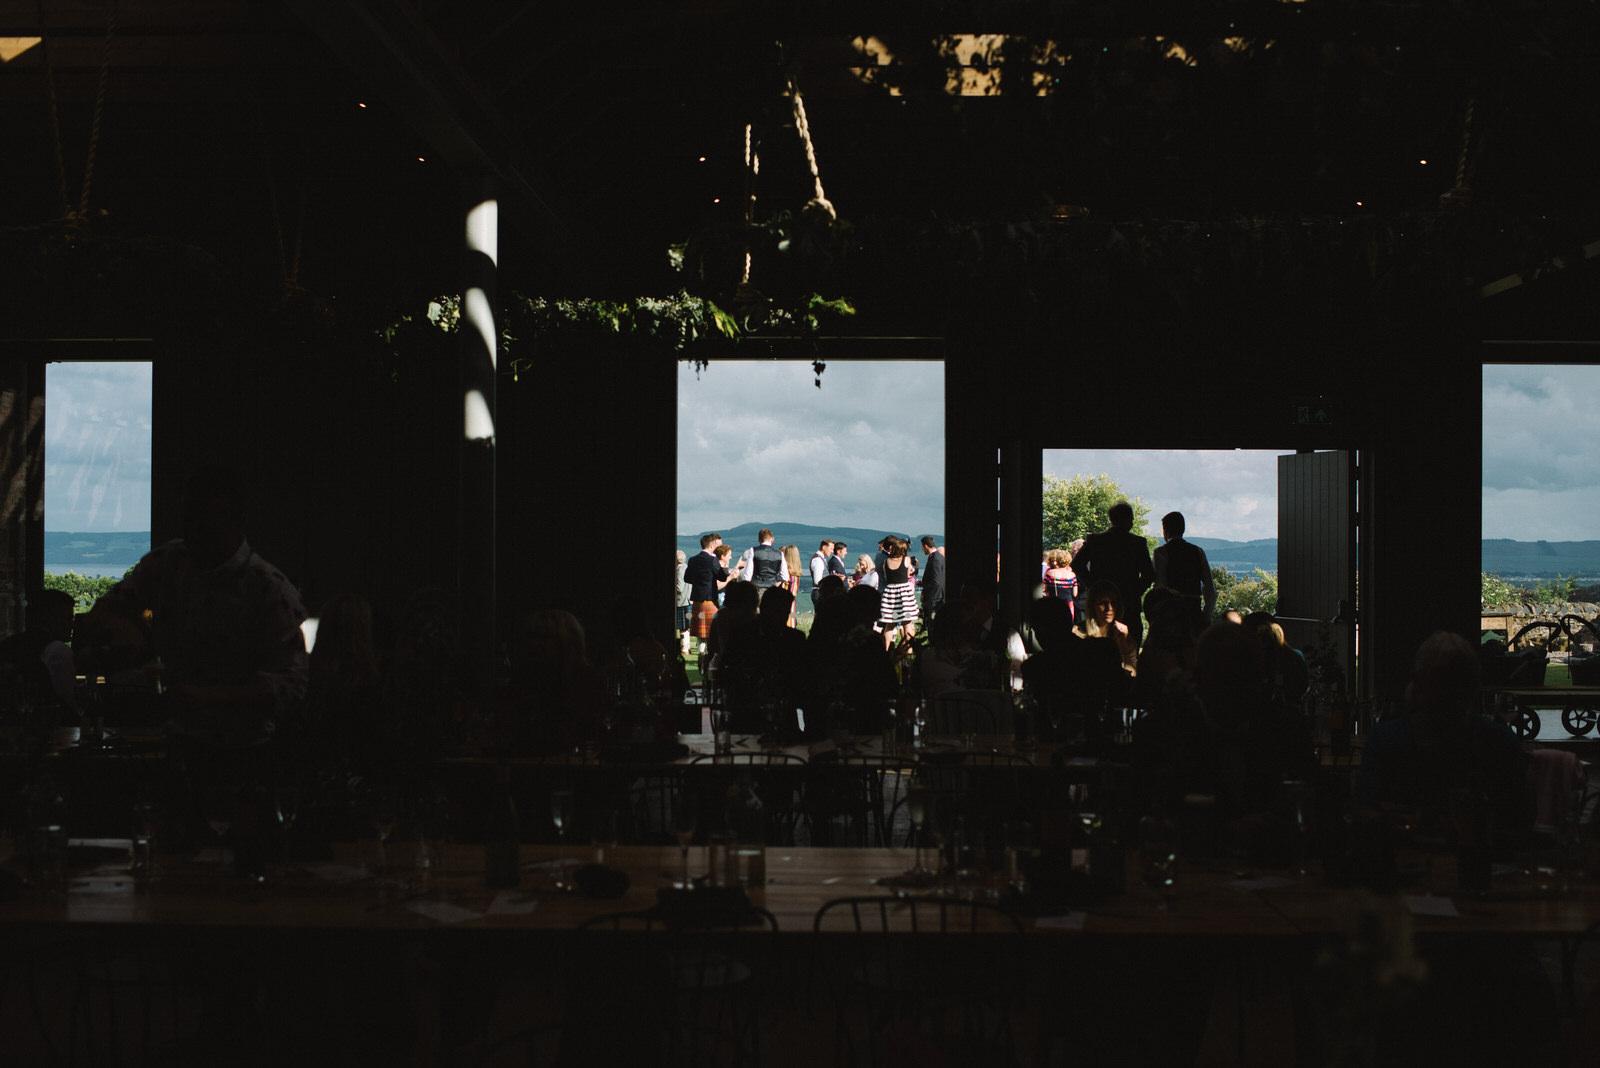 052-GUARDSWELL-FARM-WEDDING-ALTERNATIVE-SCOTTISH-WEDDING-PHOTOGRAPHER-SCOTTISH-WEDDING-DESTINATION-WEDDING-PHOTOGRAPHER.JPG